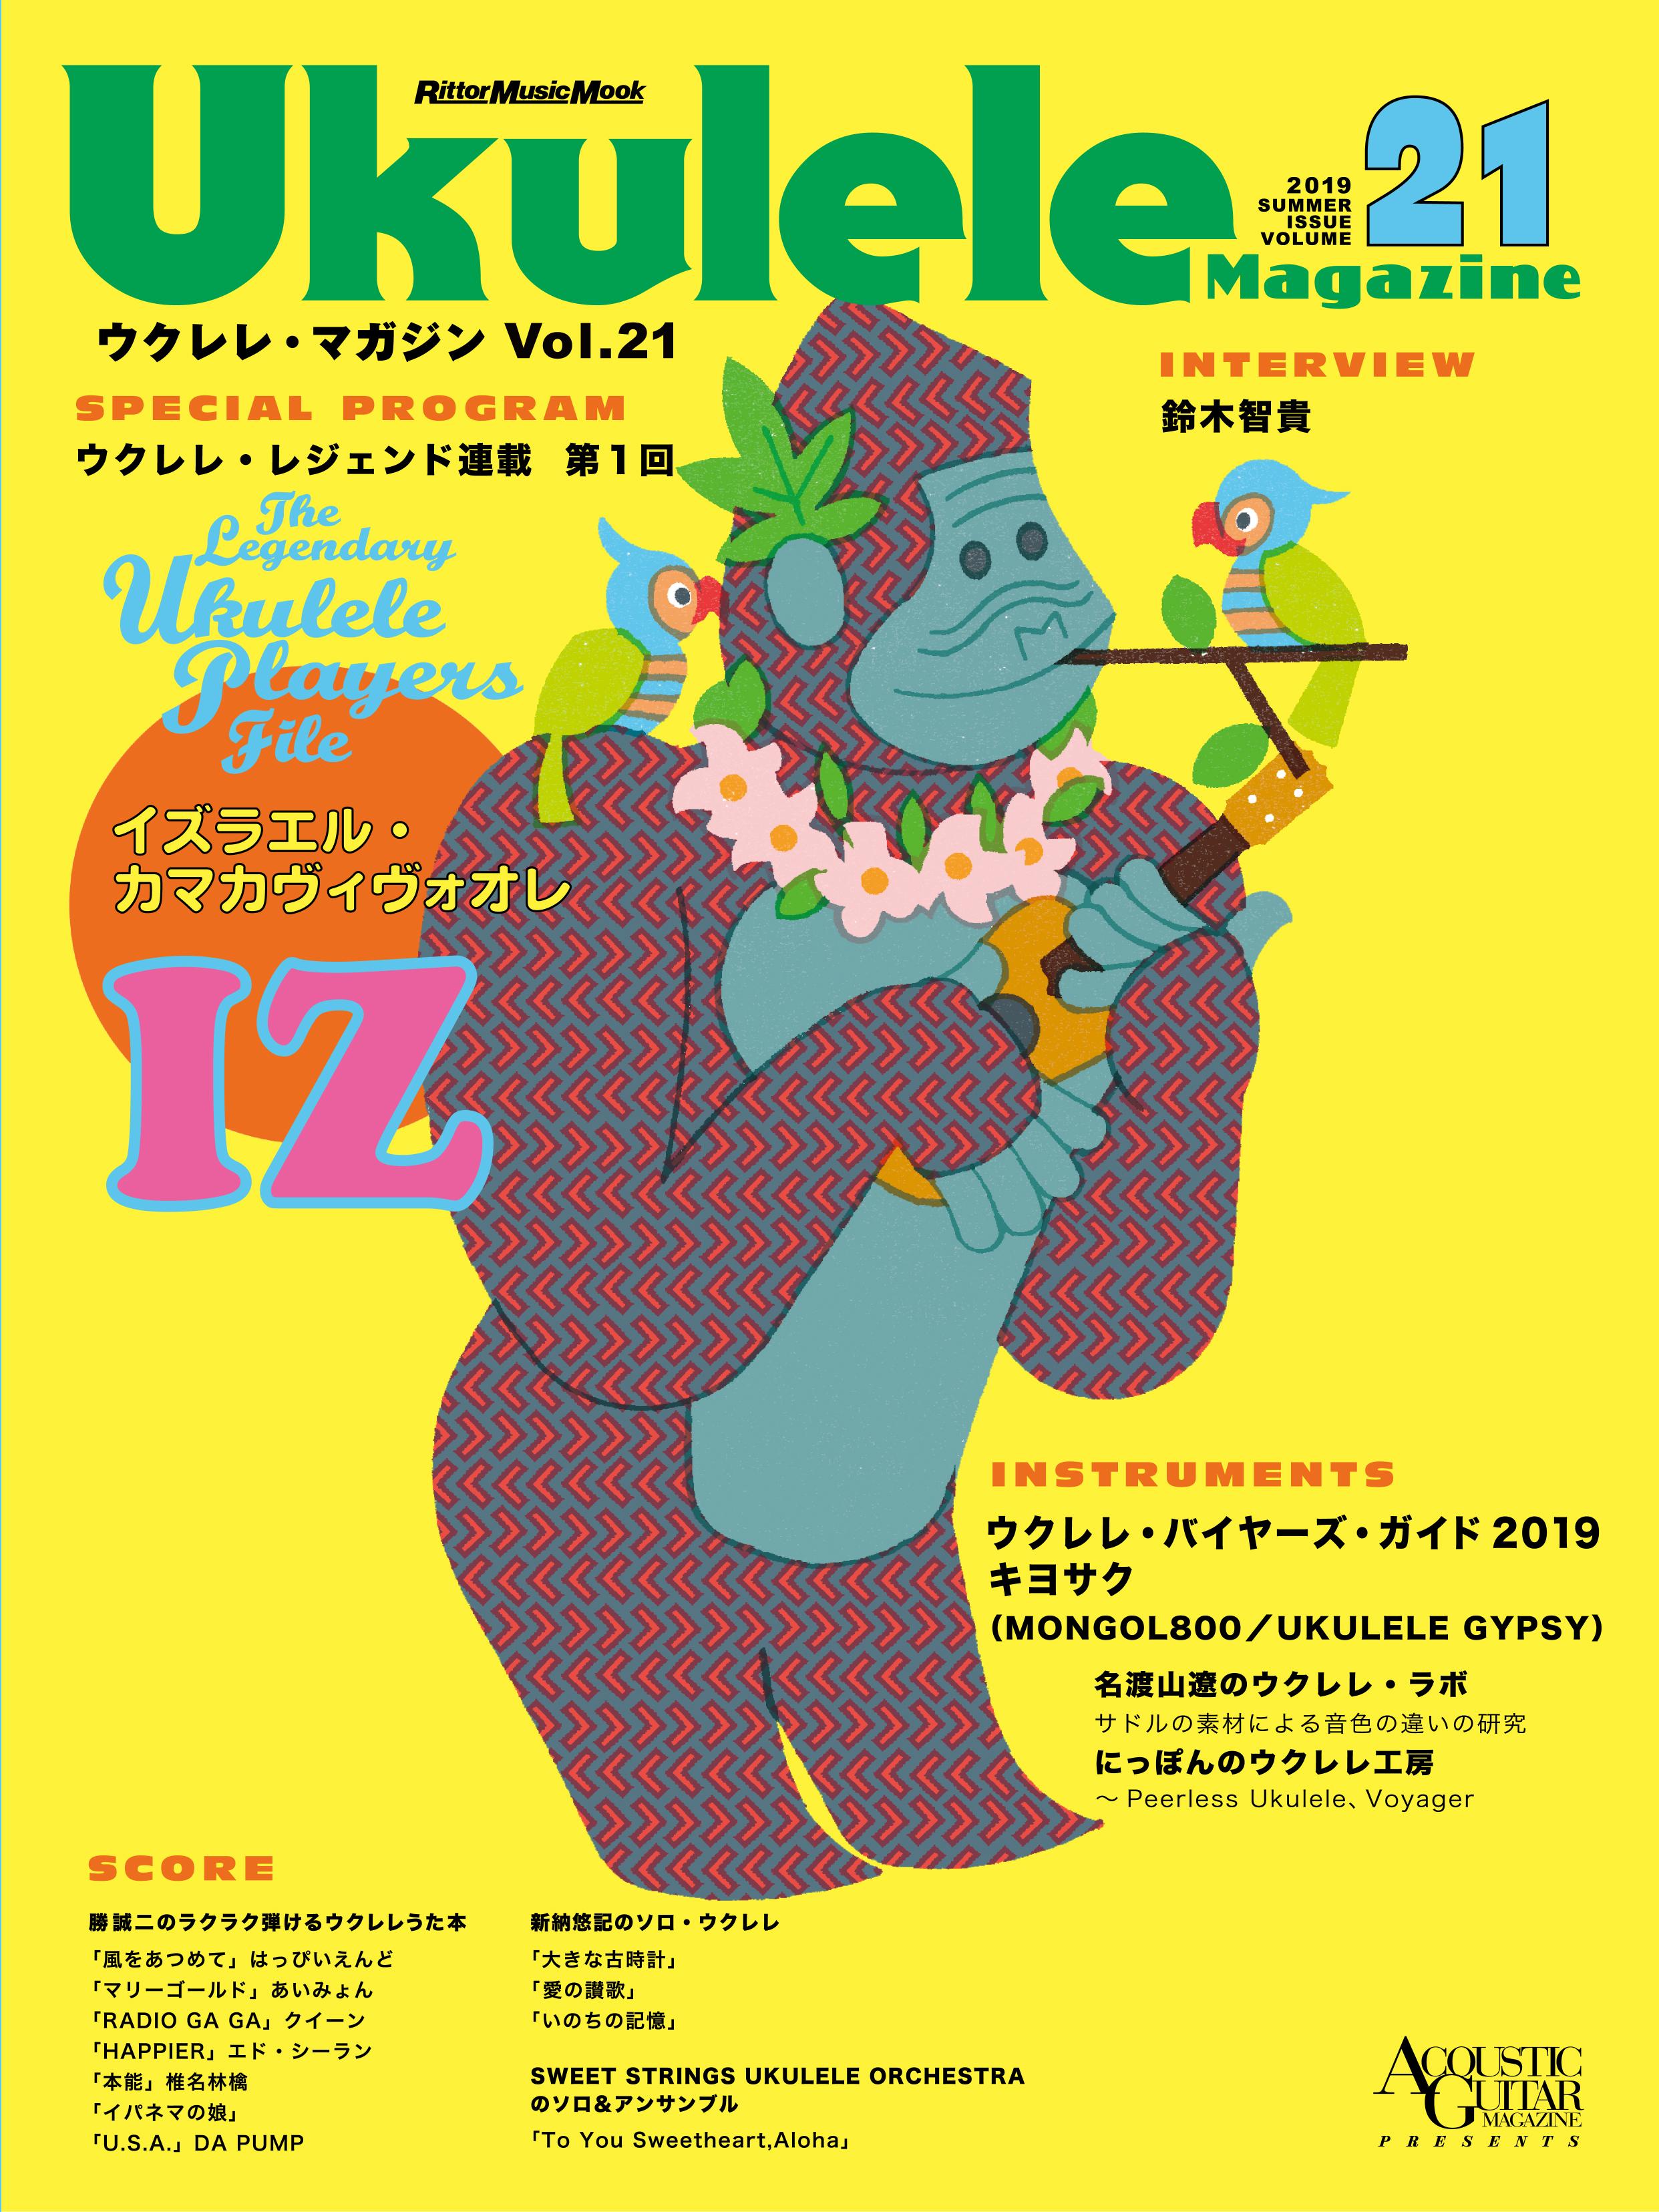 190620_ukll_hyoushi.jpg